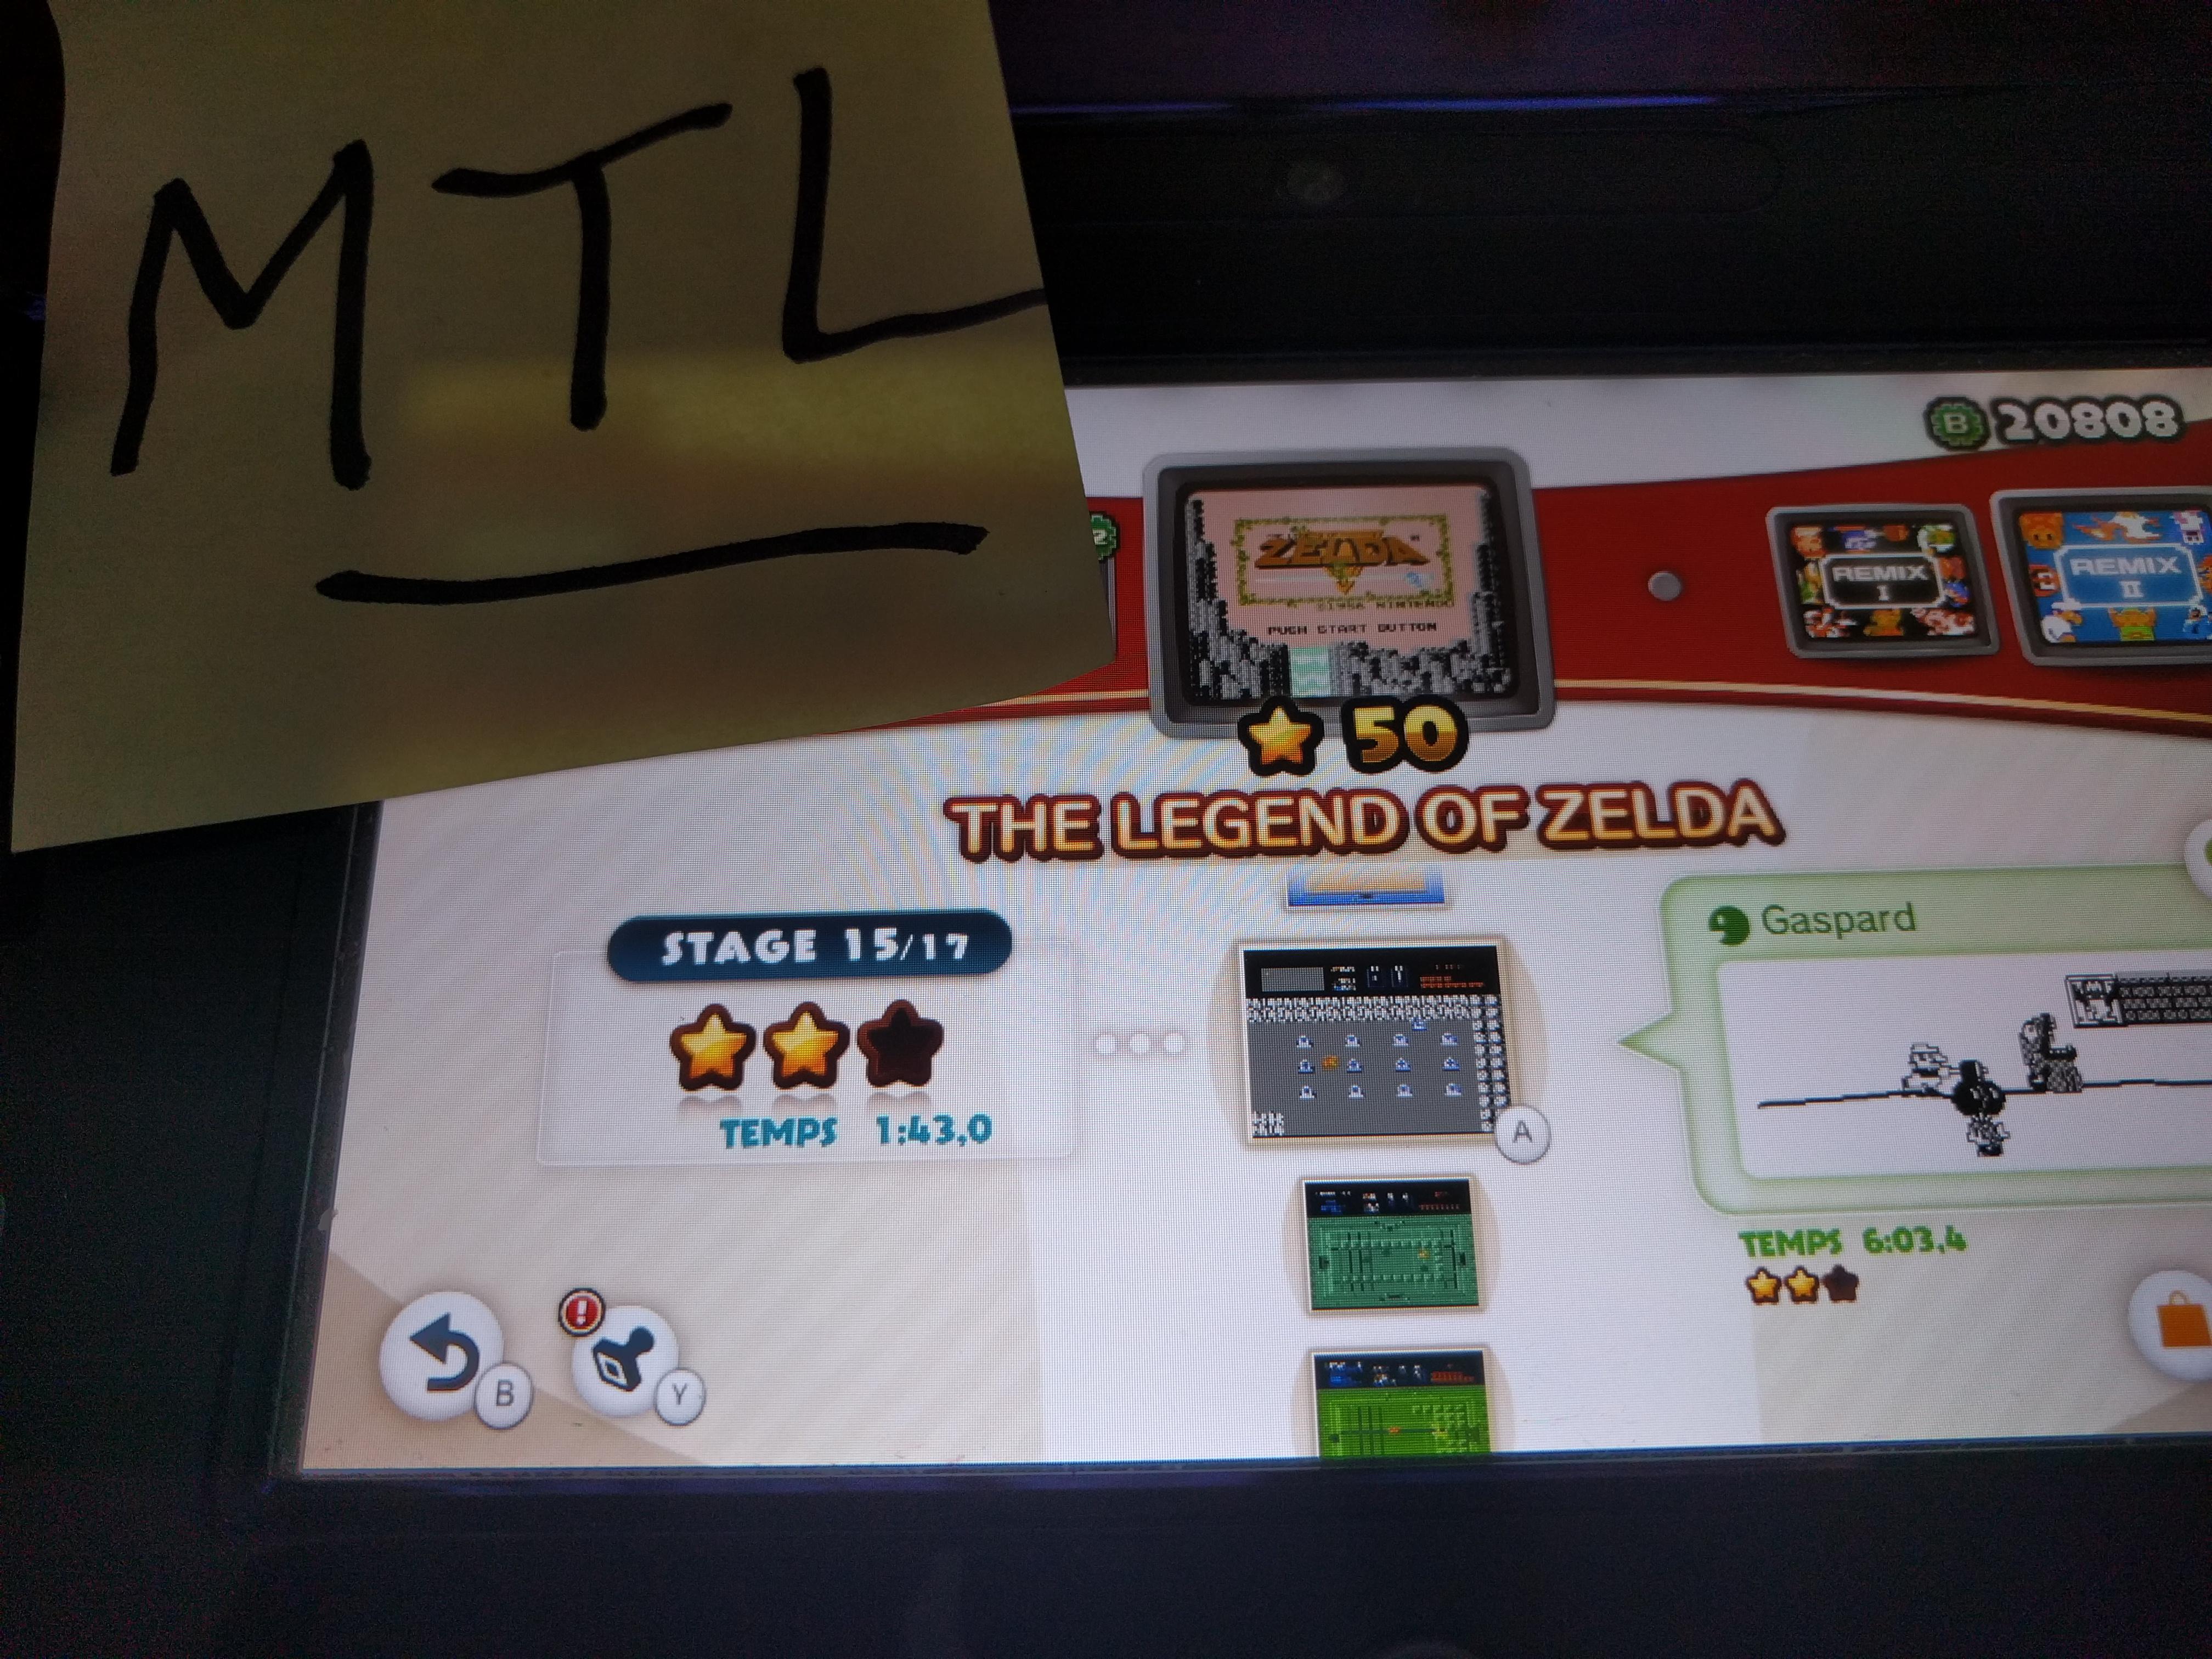 Mantalow: NES Remix: The Legend of Zelda: Stage 15 (Wii U) 0:01:43 points on 2016-06-10 19:12:49